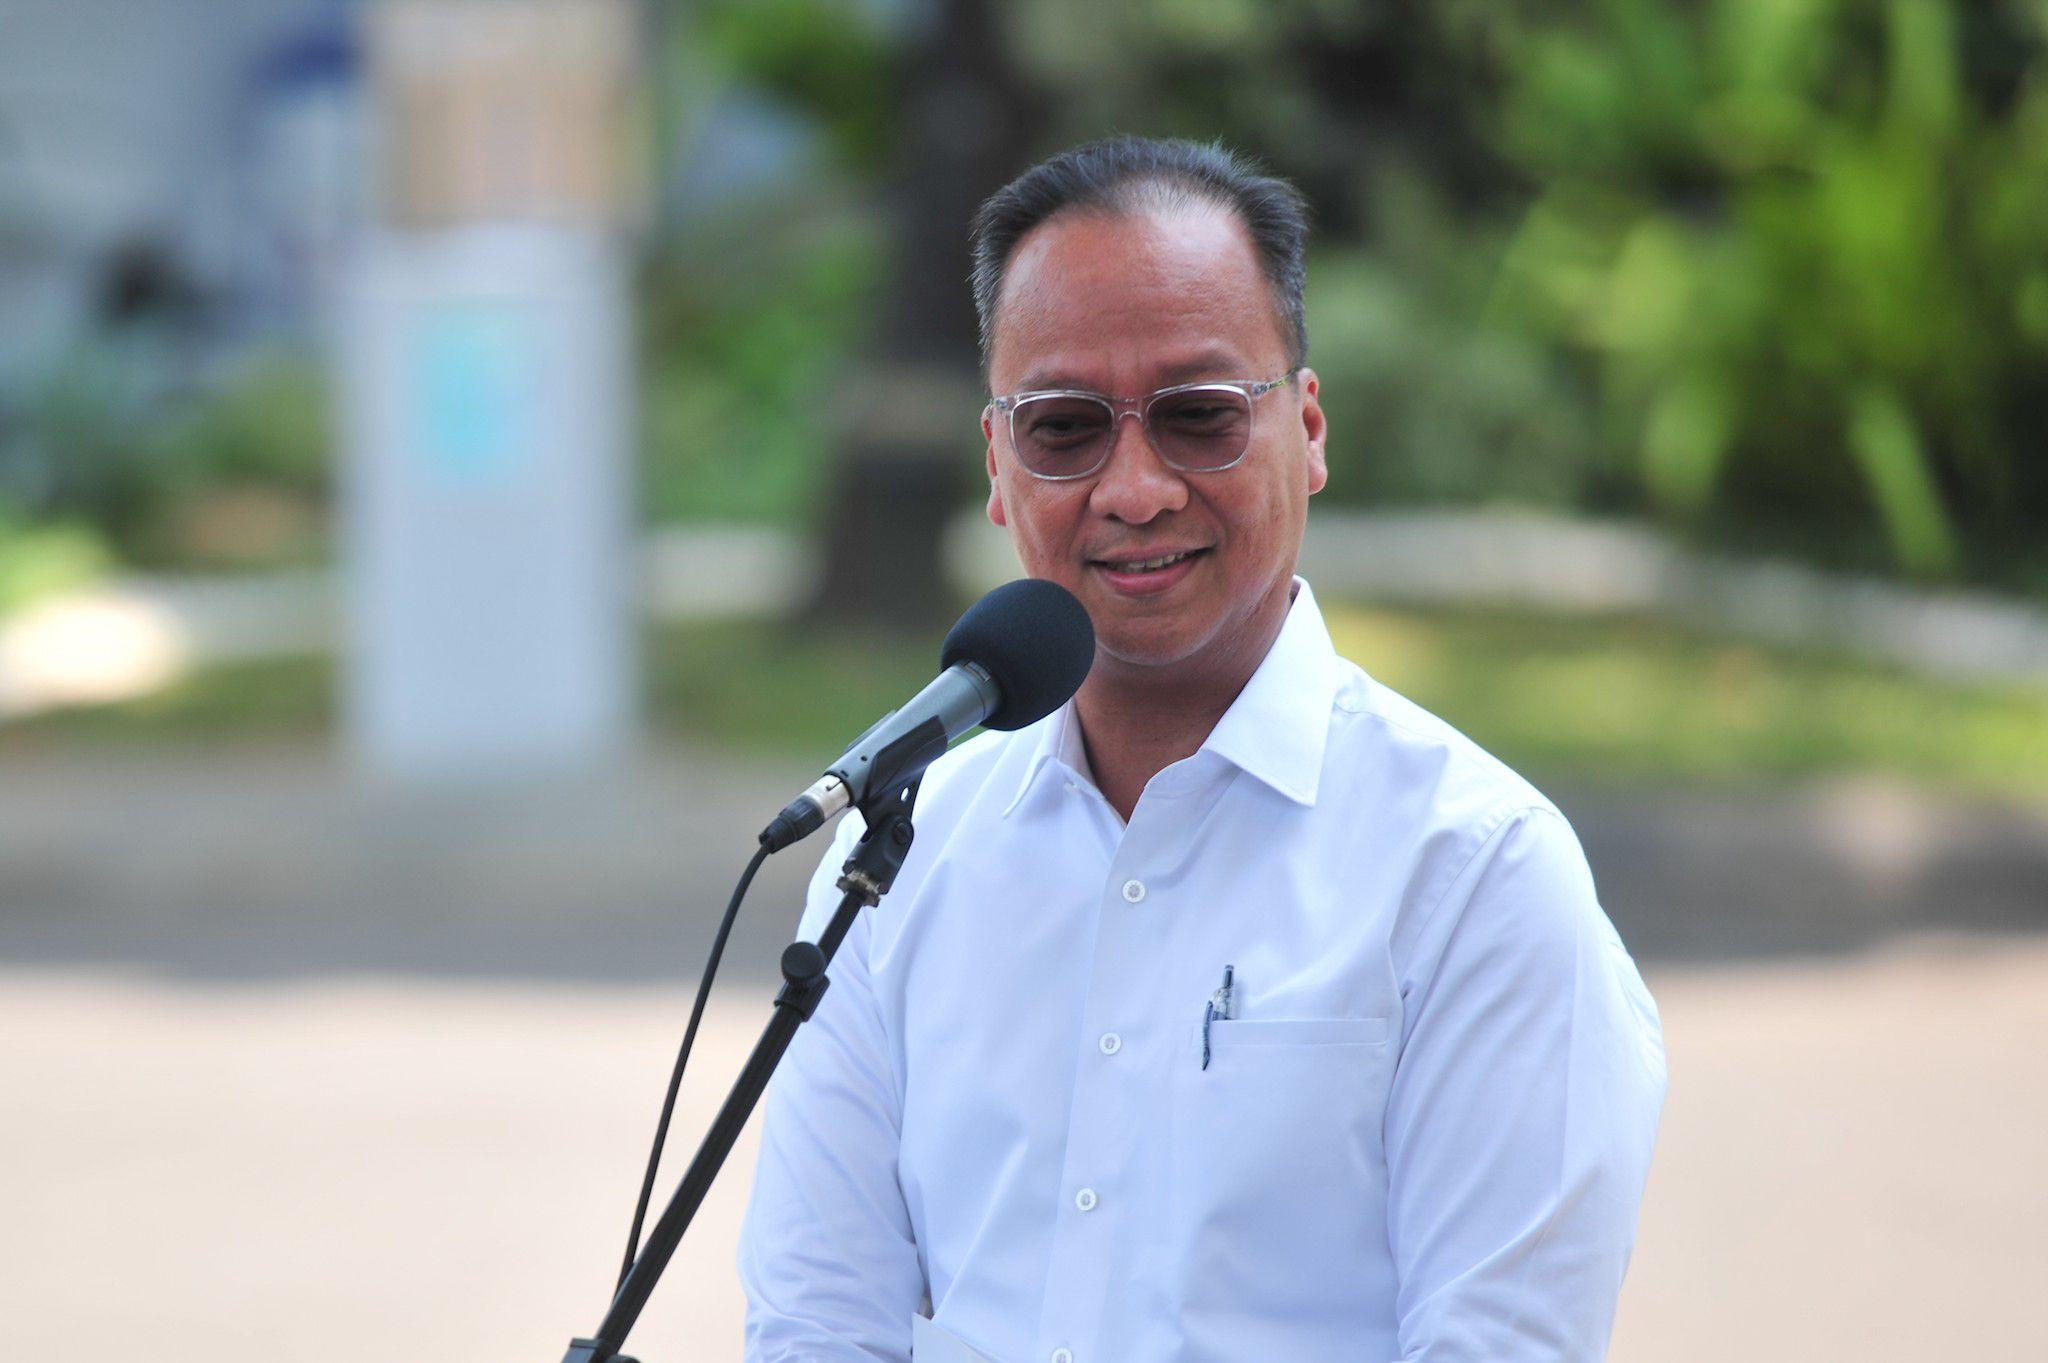 Menperin Agus Gumiwang Kartasasmita (Foto: Dokumentasi Humas Setkab)